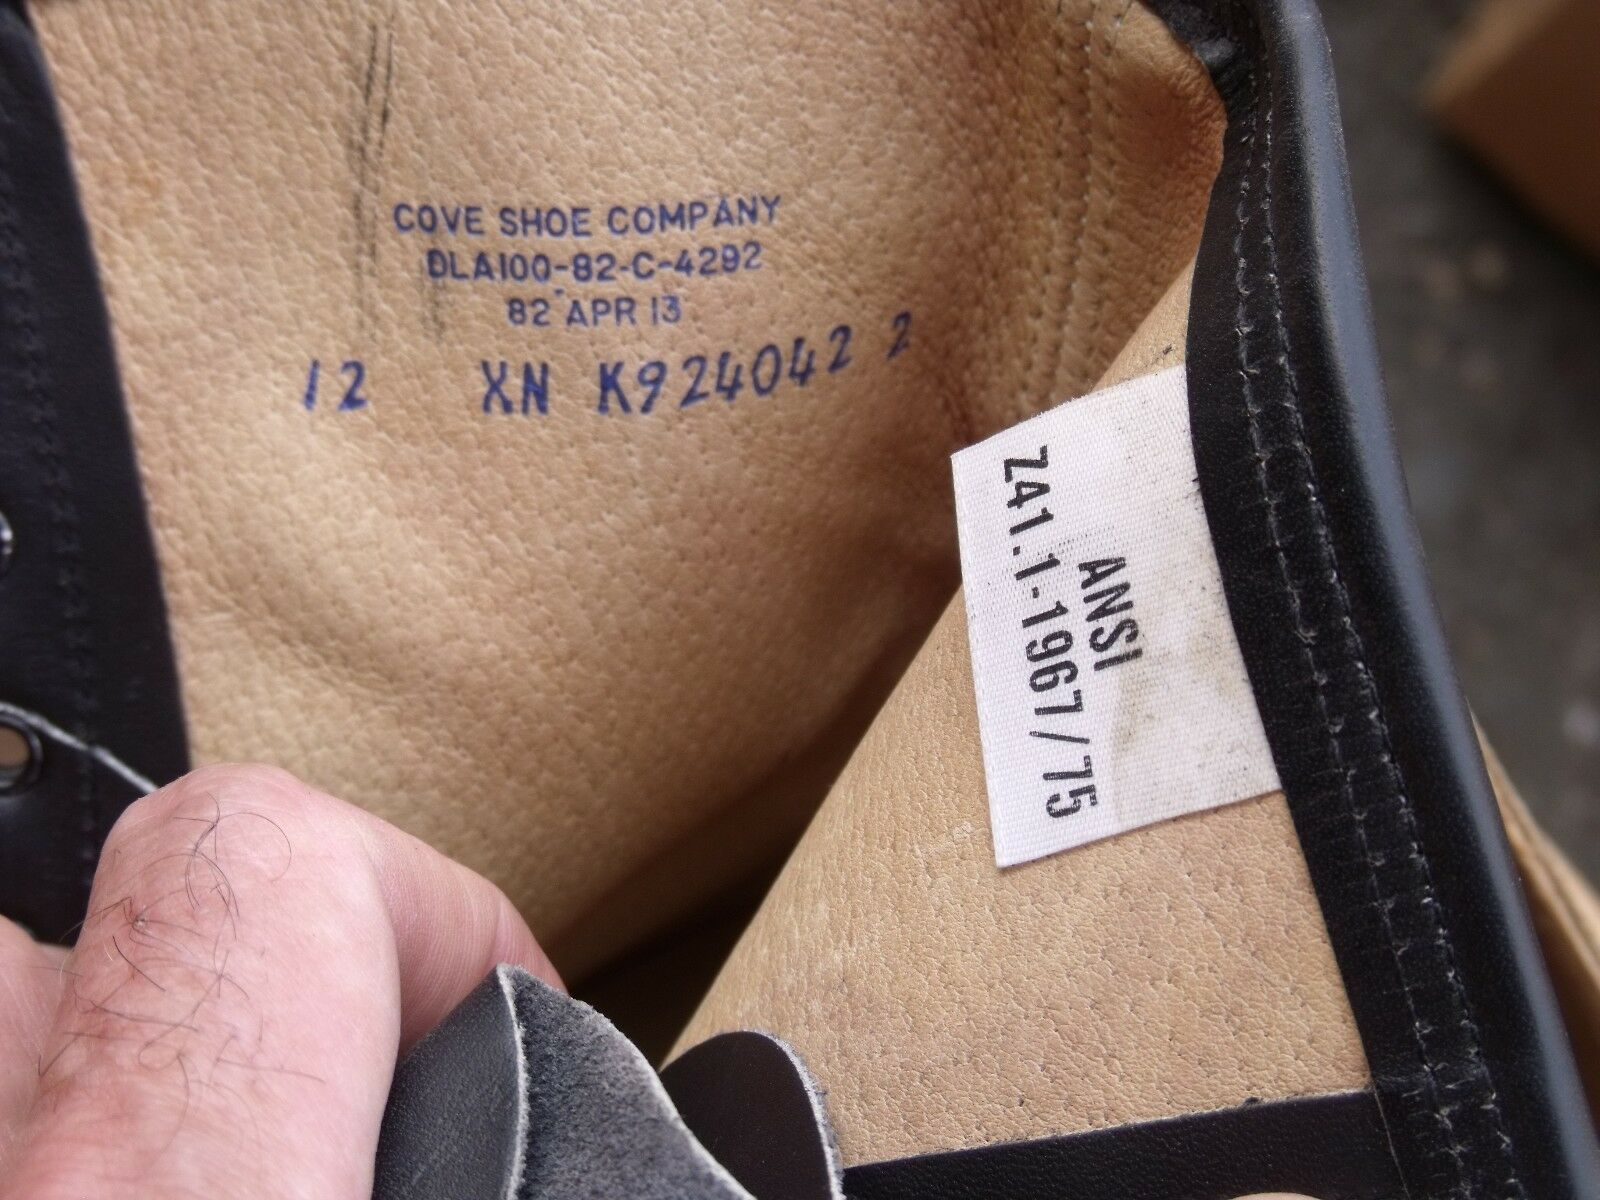 Steel Toe US ARMY Safety Stivali Pelle Work Non Non Non Slip Fuel Resistant NEW 4fc694